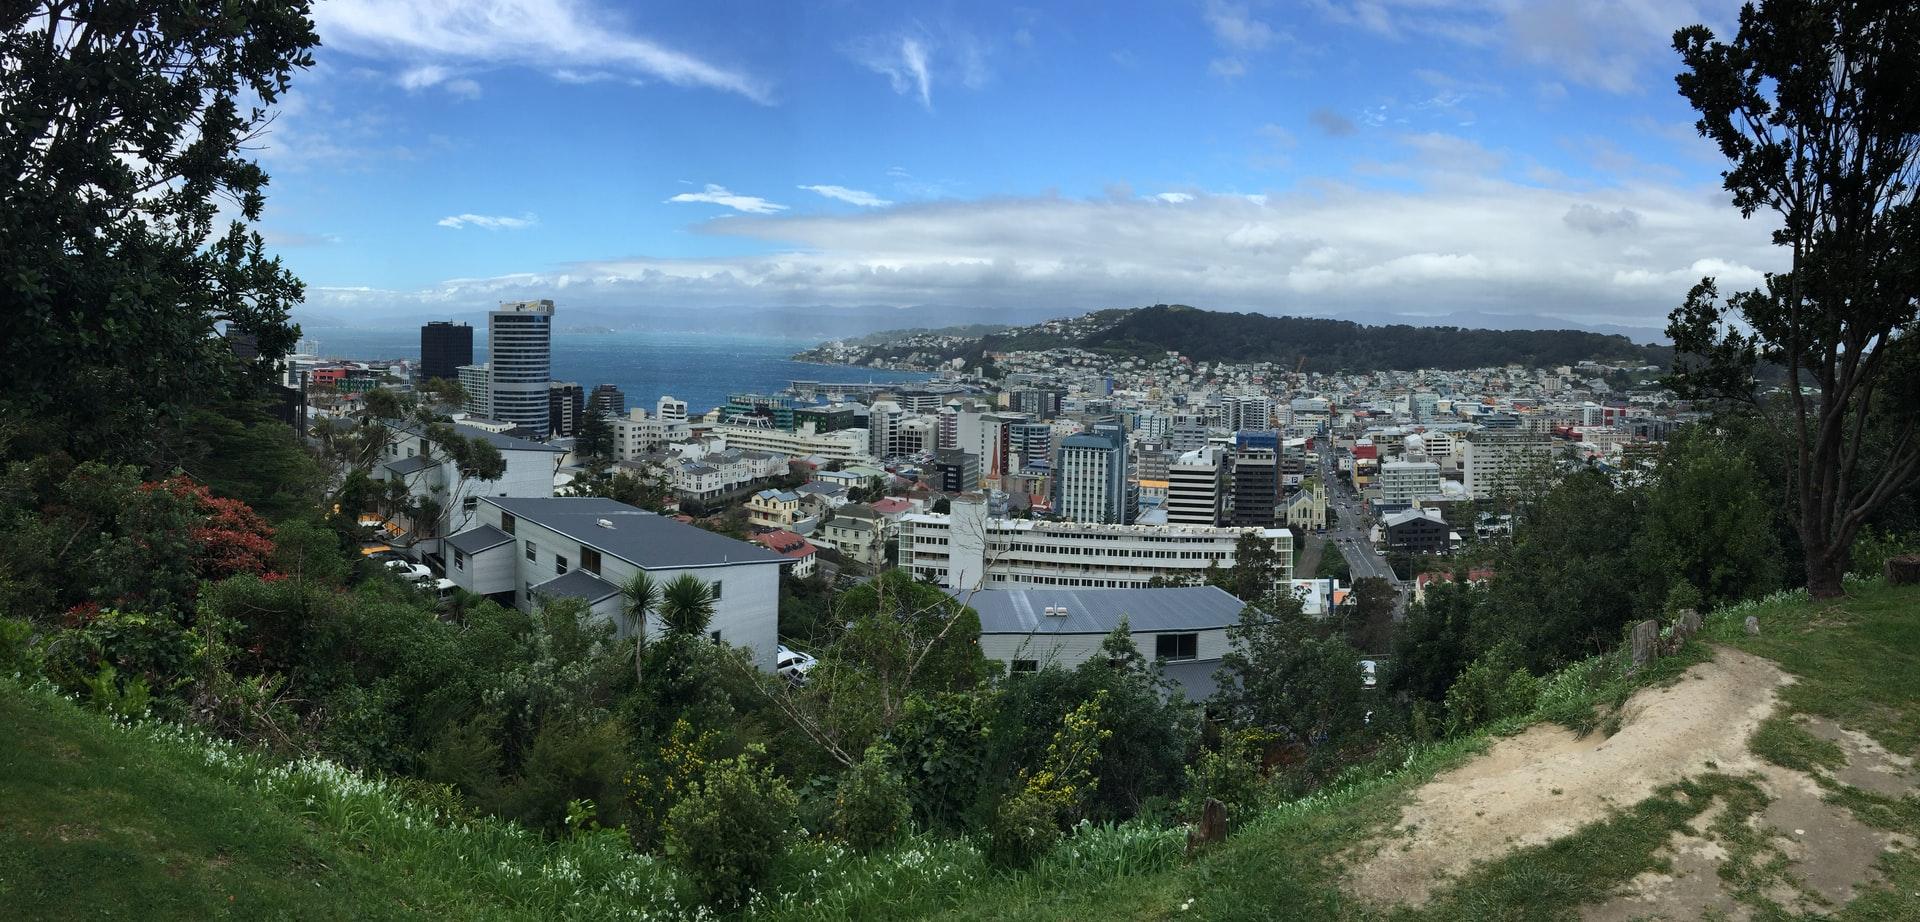 The City of Wellington. Source: Sanjeev Bothra at Unsplash